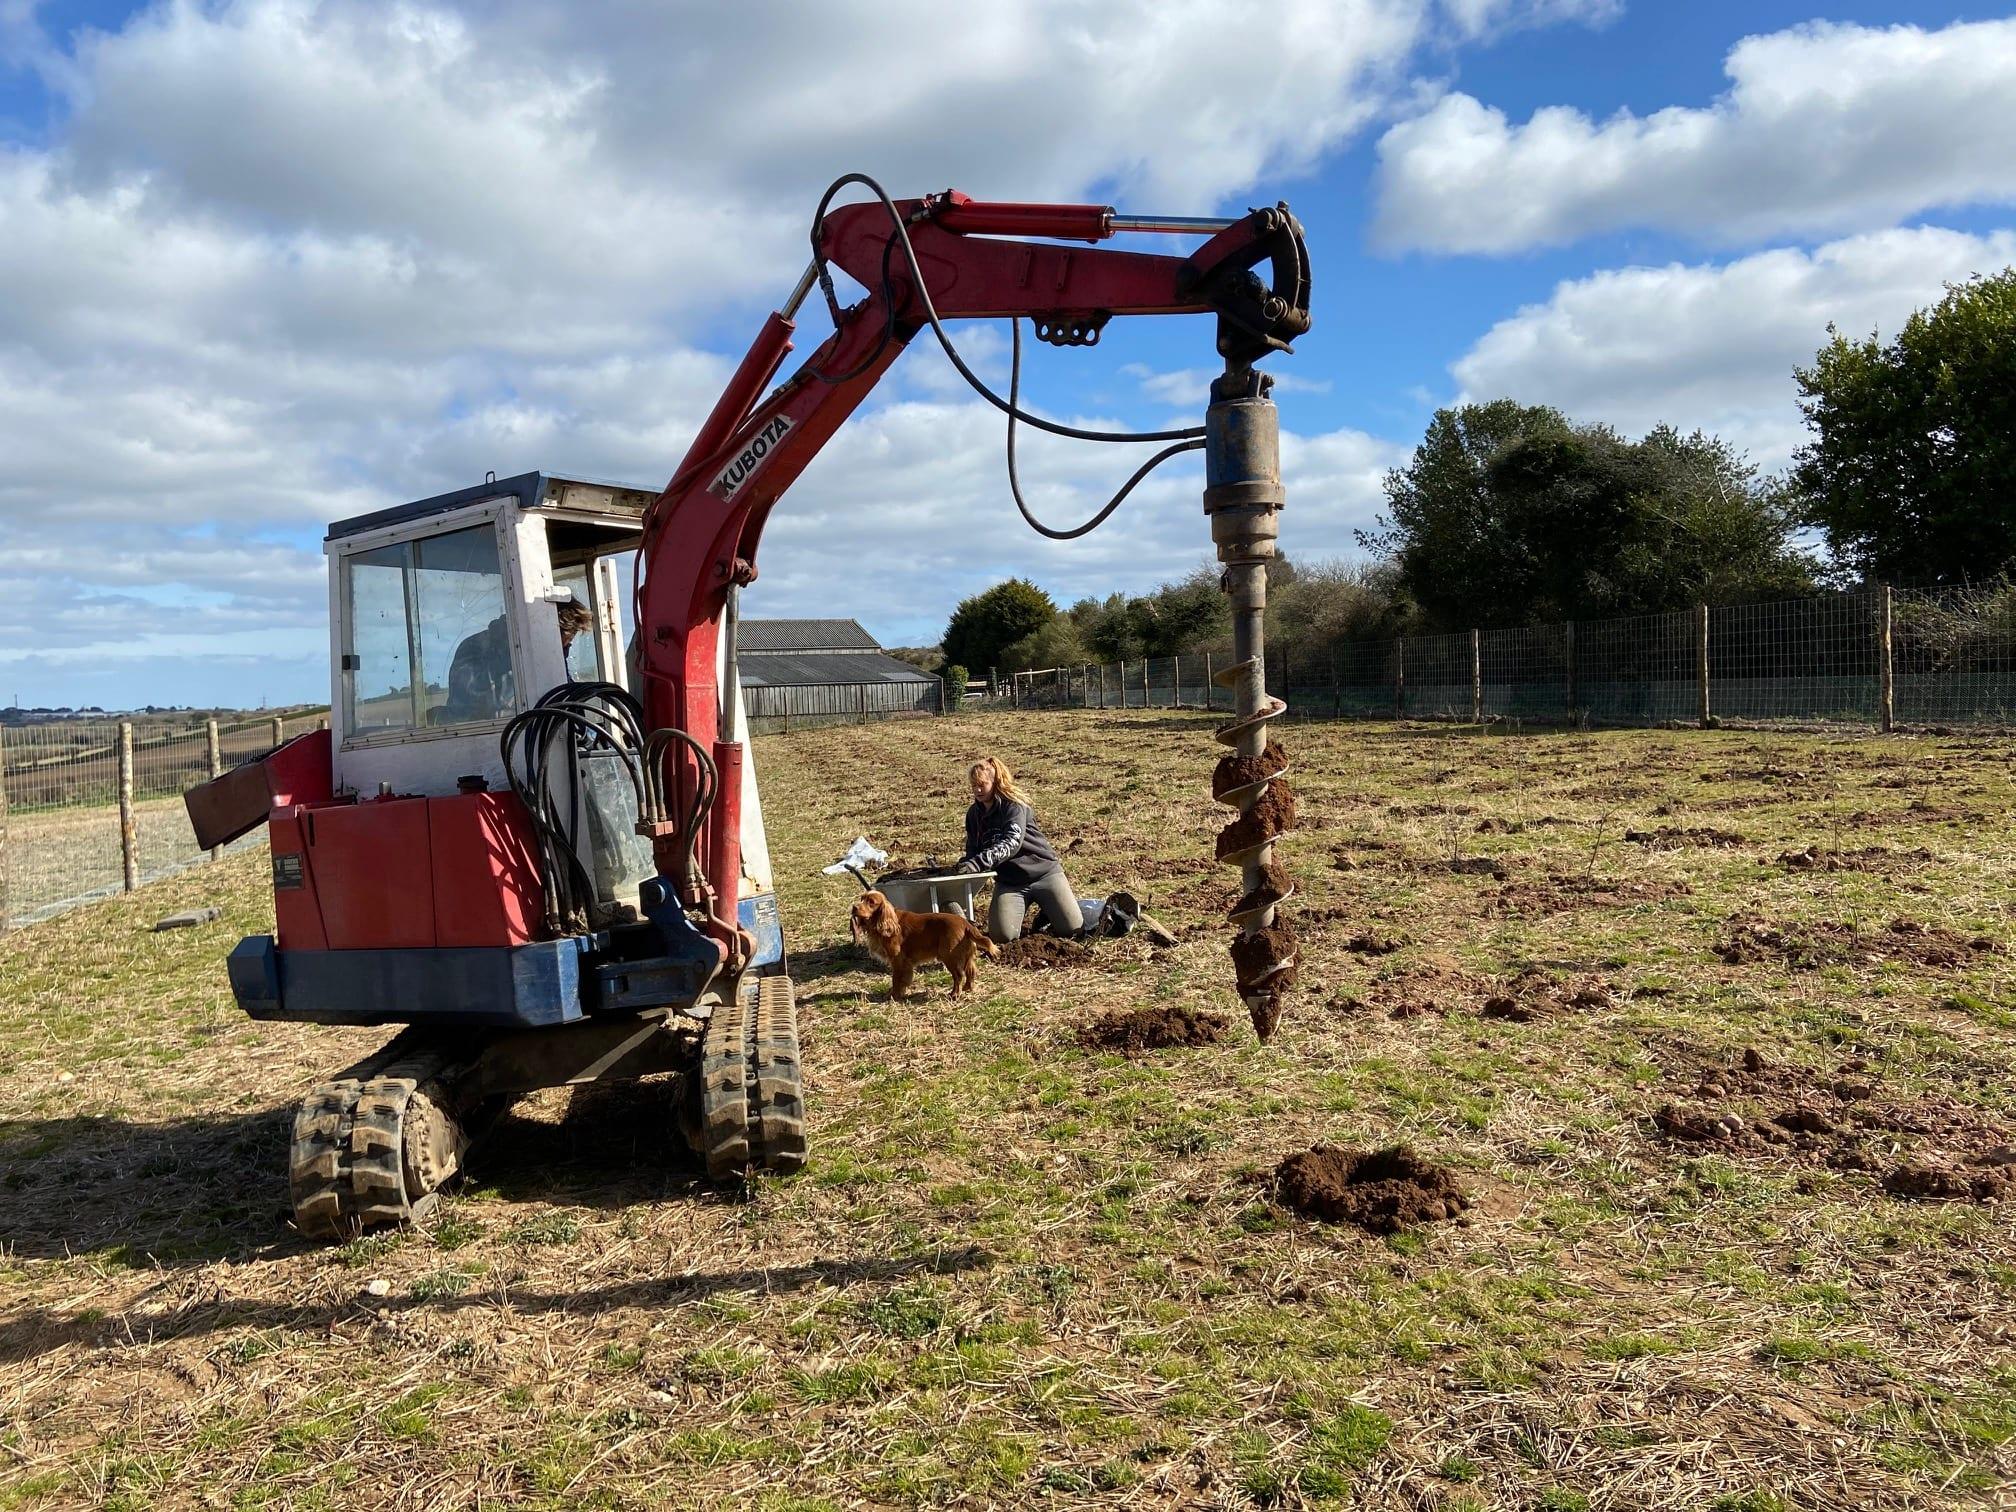 Creating a tree nursery at Langarth Garden Village